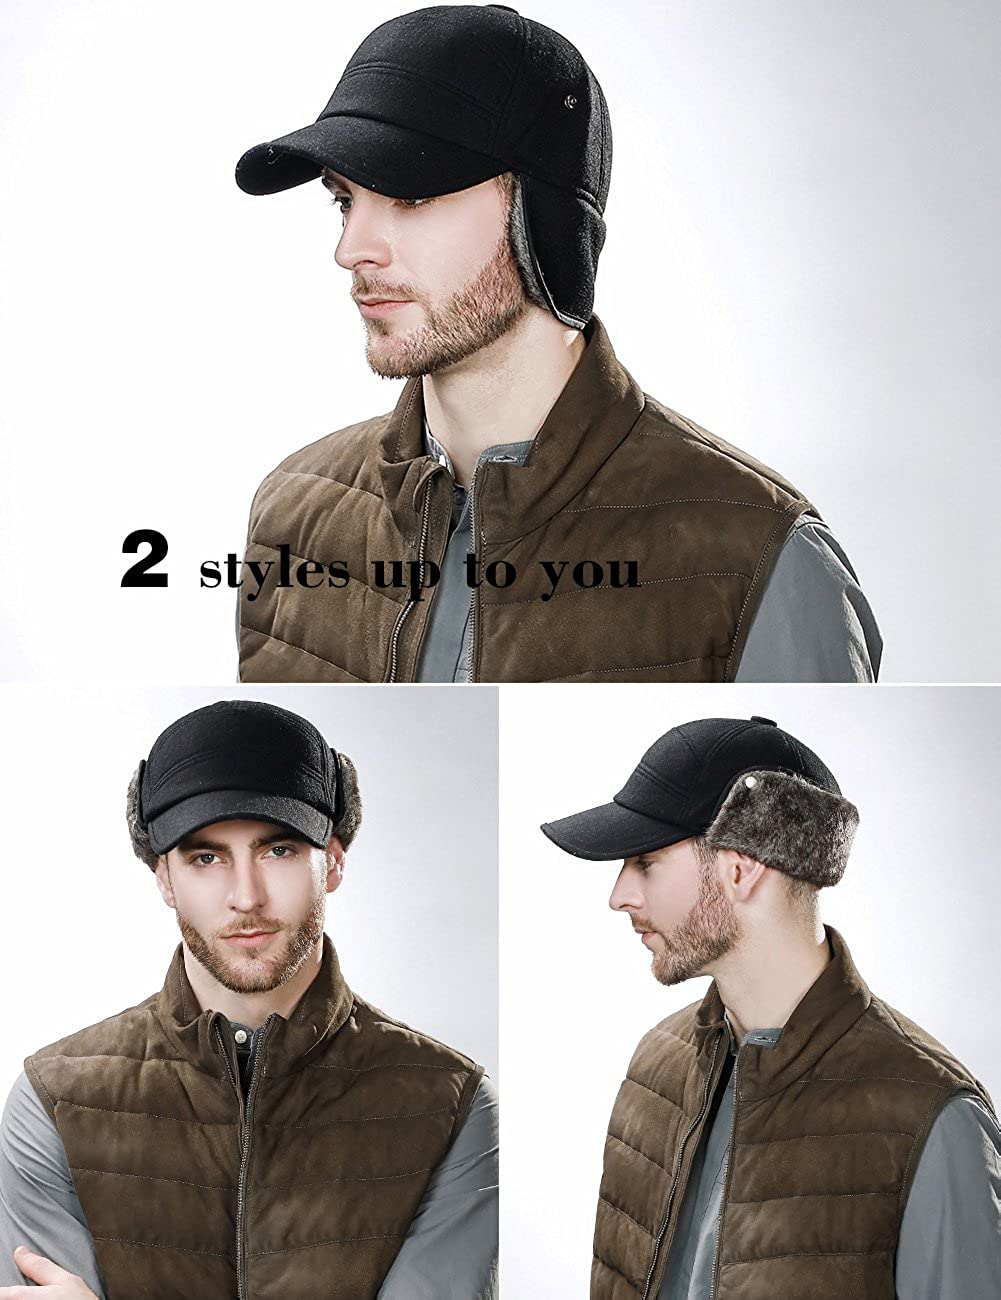 Jagdm/ütze mit Ohrenklappen Unisex verstellbar Gr 99707/_Coffee Camo dick gef/üttert gesteppt w/ärmend Fancet Winterm/ütze mit Ohrenklappen aus Kunstfell Medium